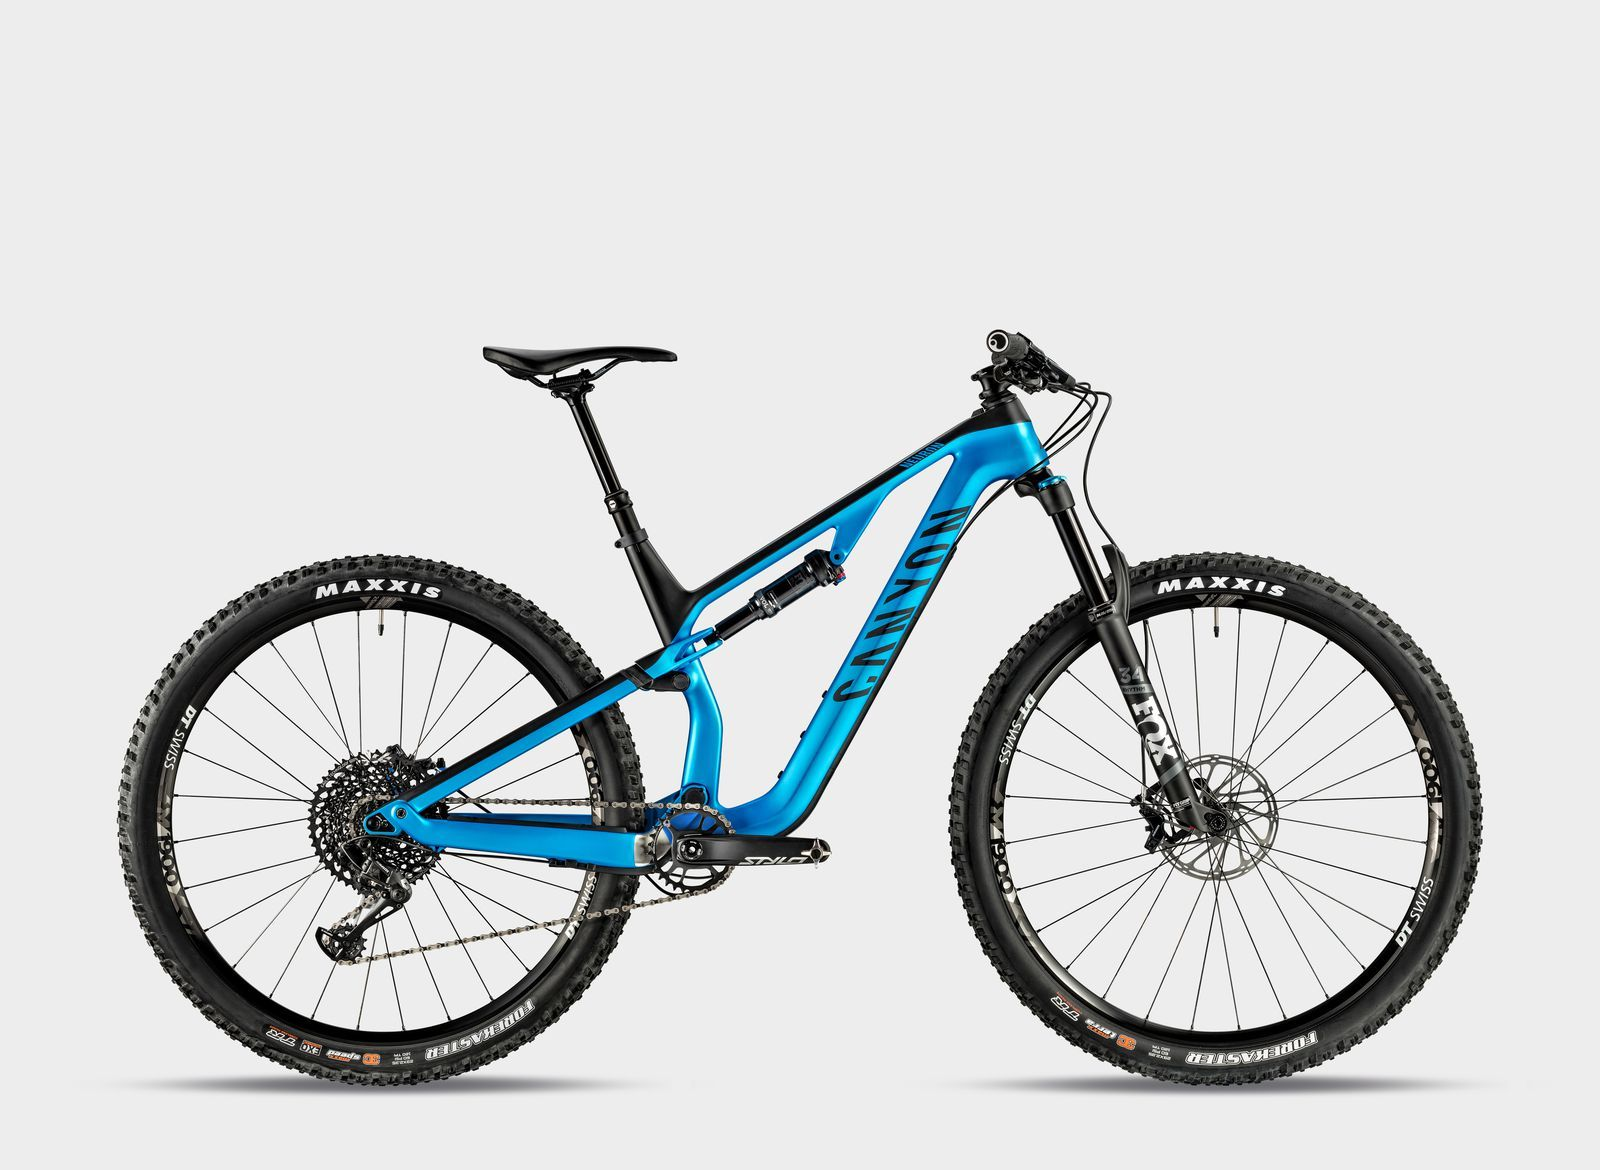 The Canyon Neuron Cf 9 0 Sl Is An Xc Racer S Trail Bike Mountain Biking Bike Canyon Strive